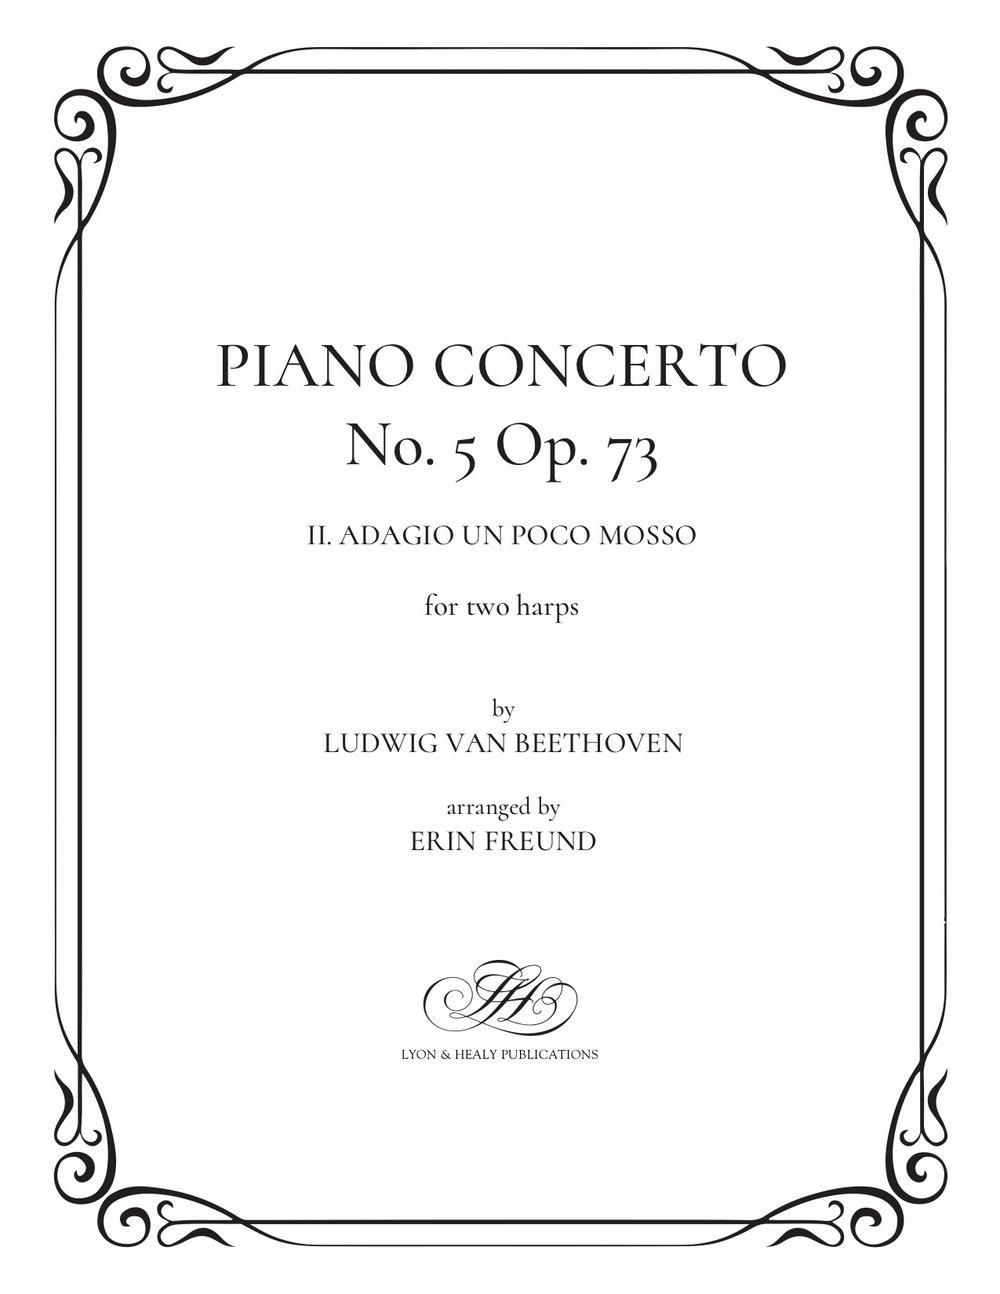 Piano Concerto No5 Op73 Lyon & Healy cover.jpg